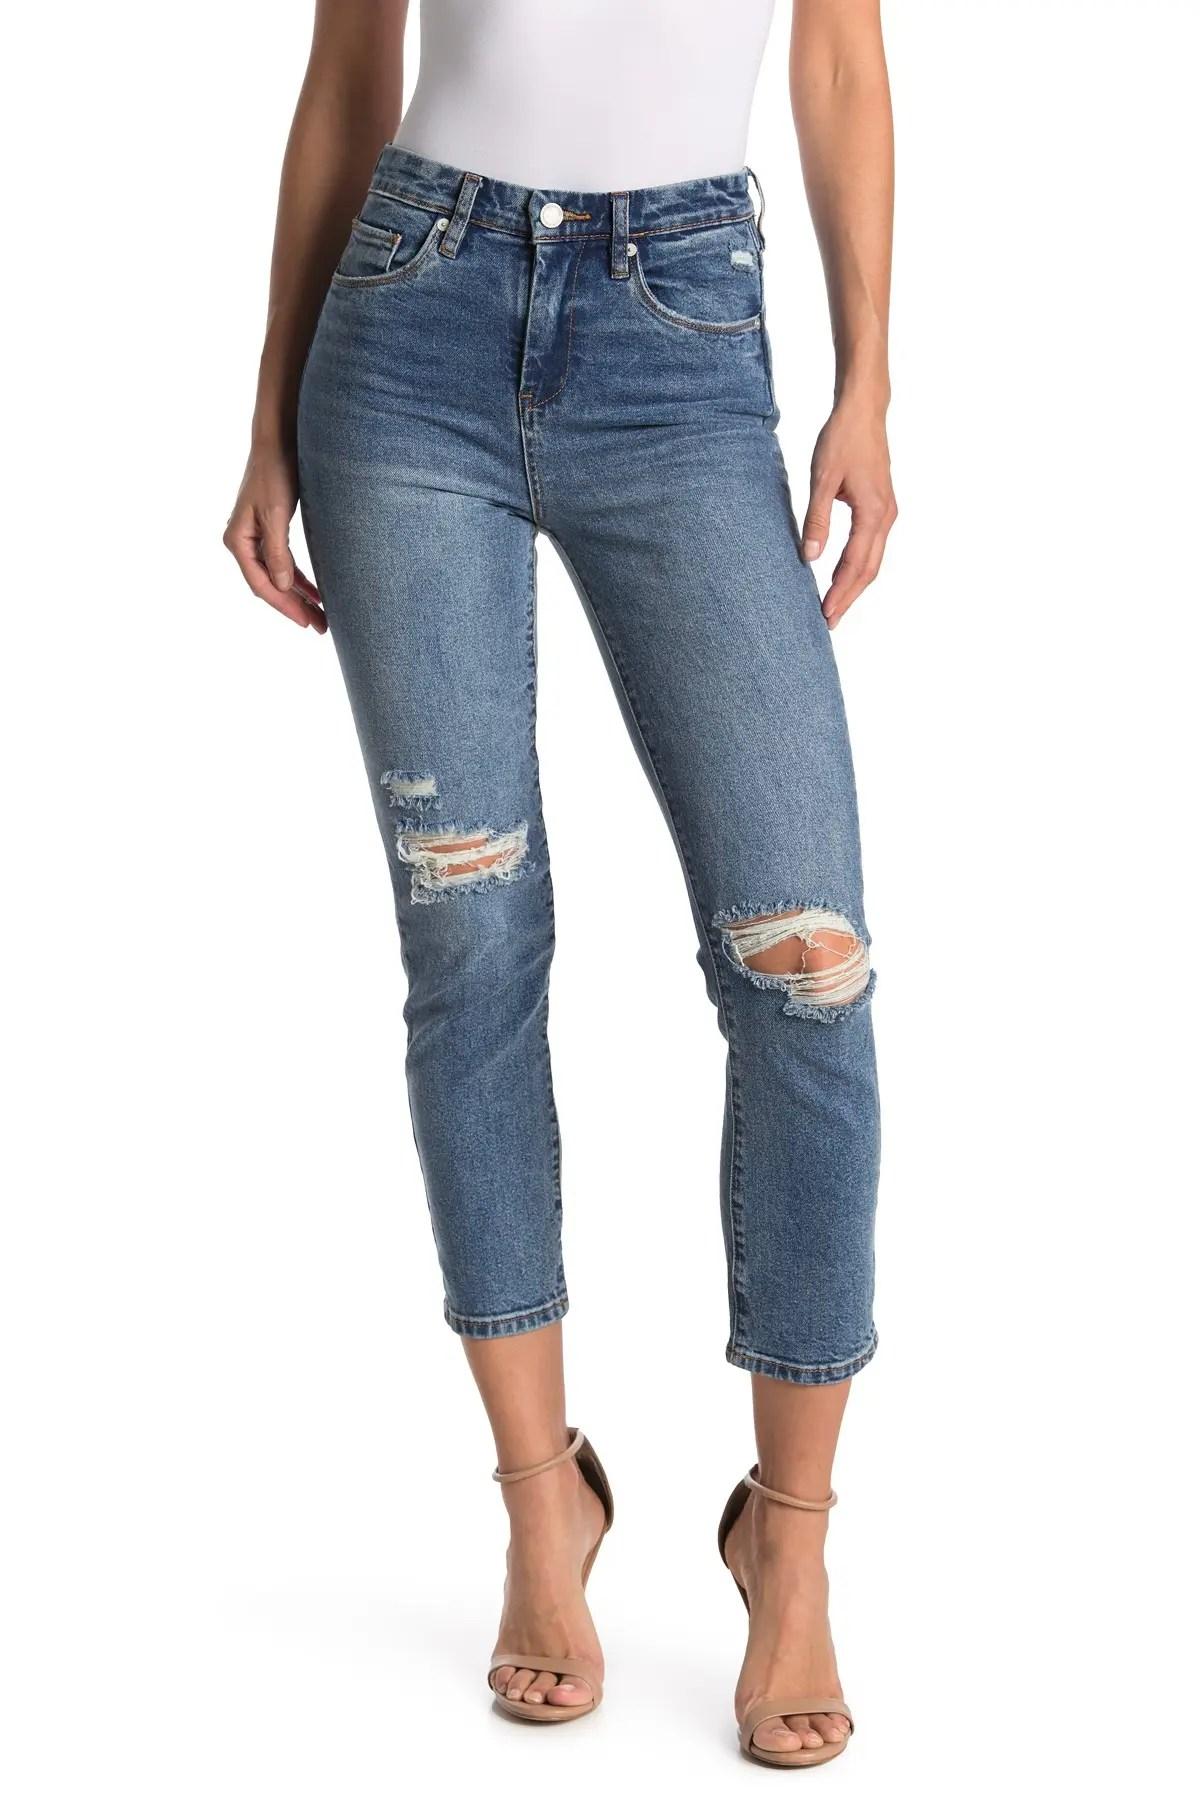 blanknyc denim distressed cropped straight leg jeans nordstrom rack